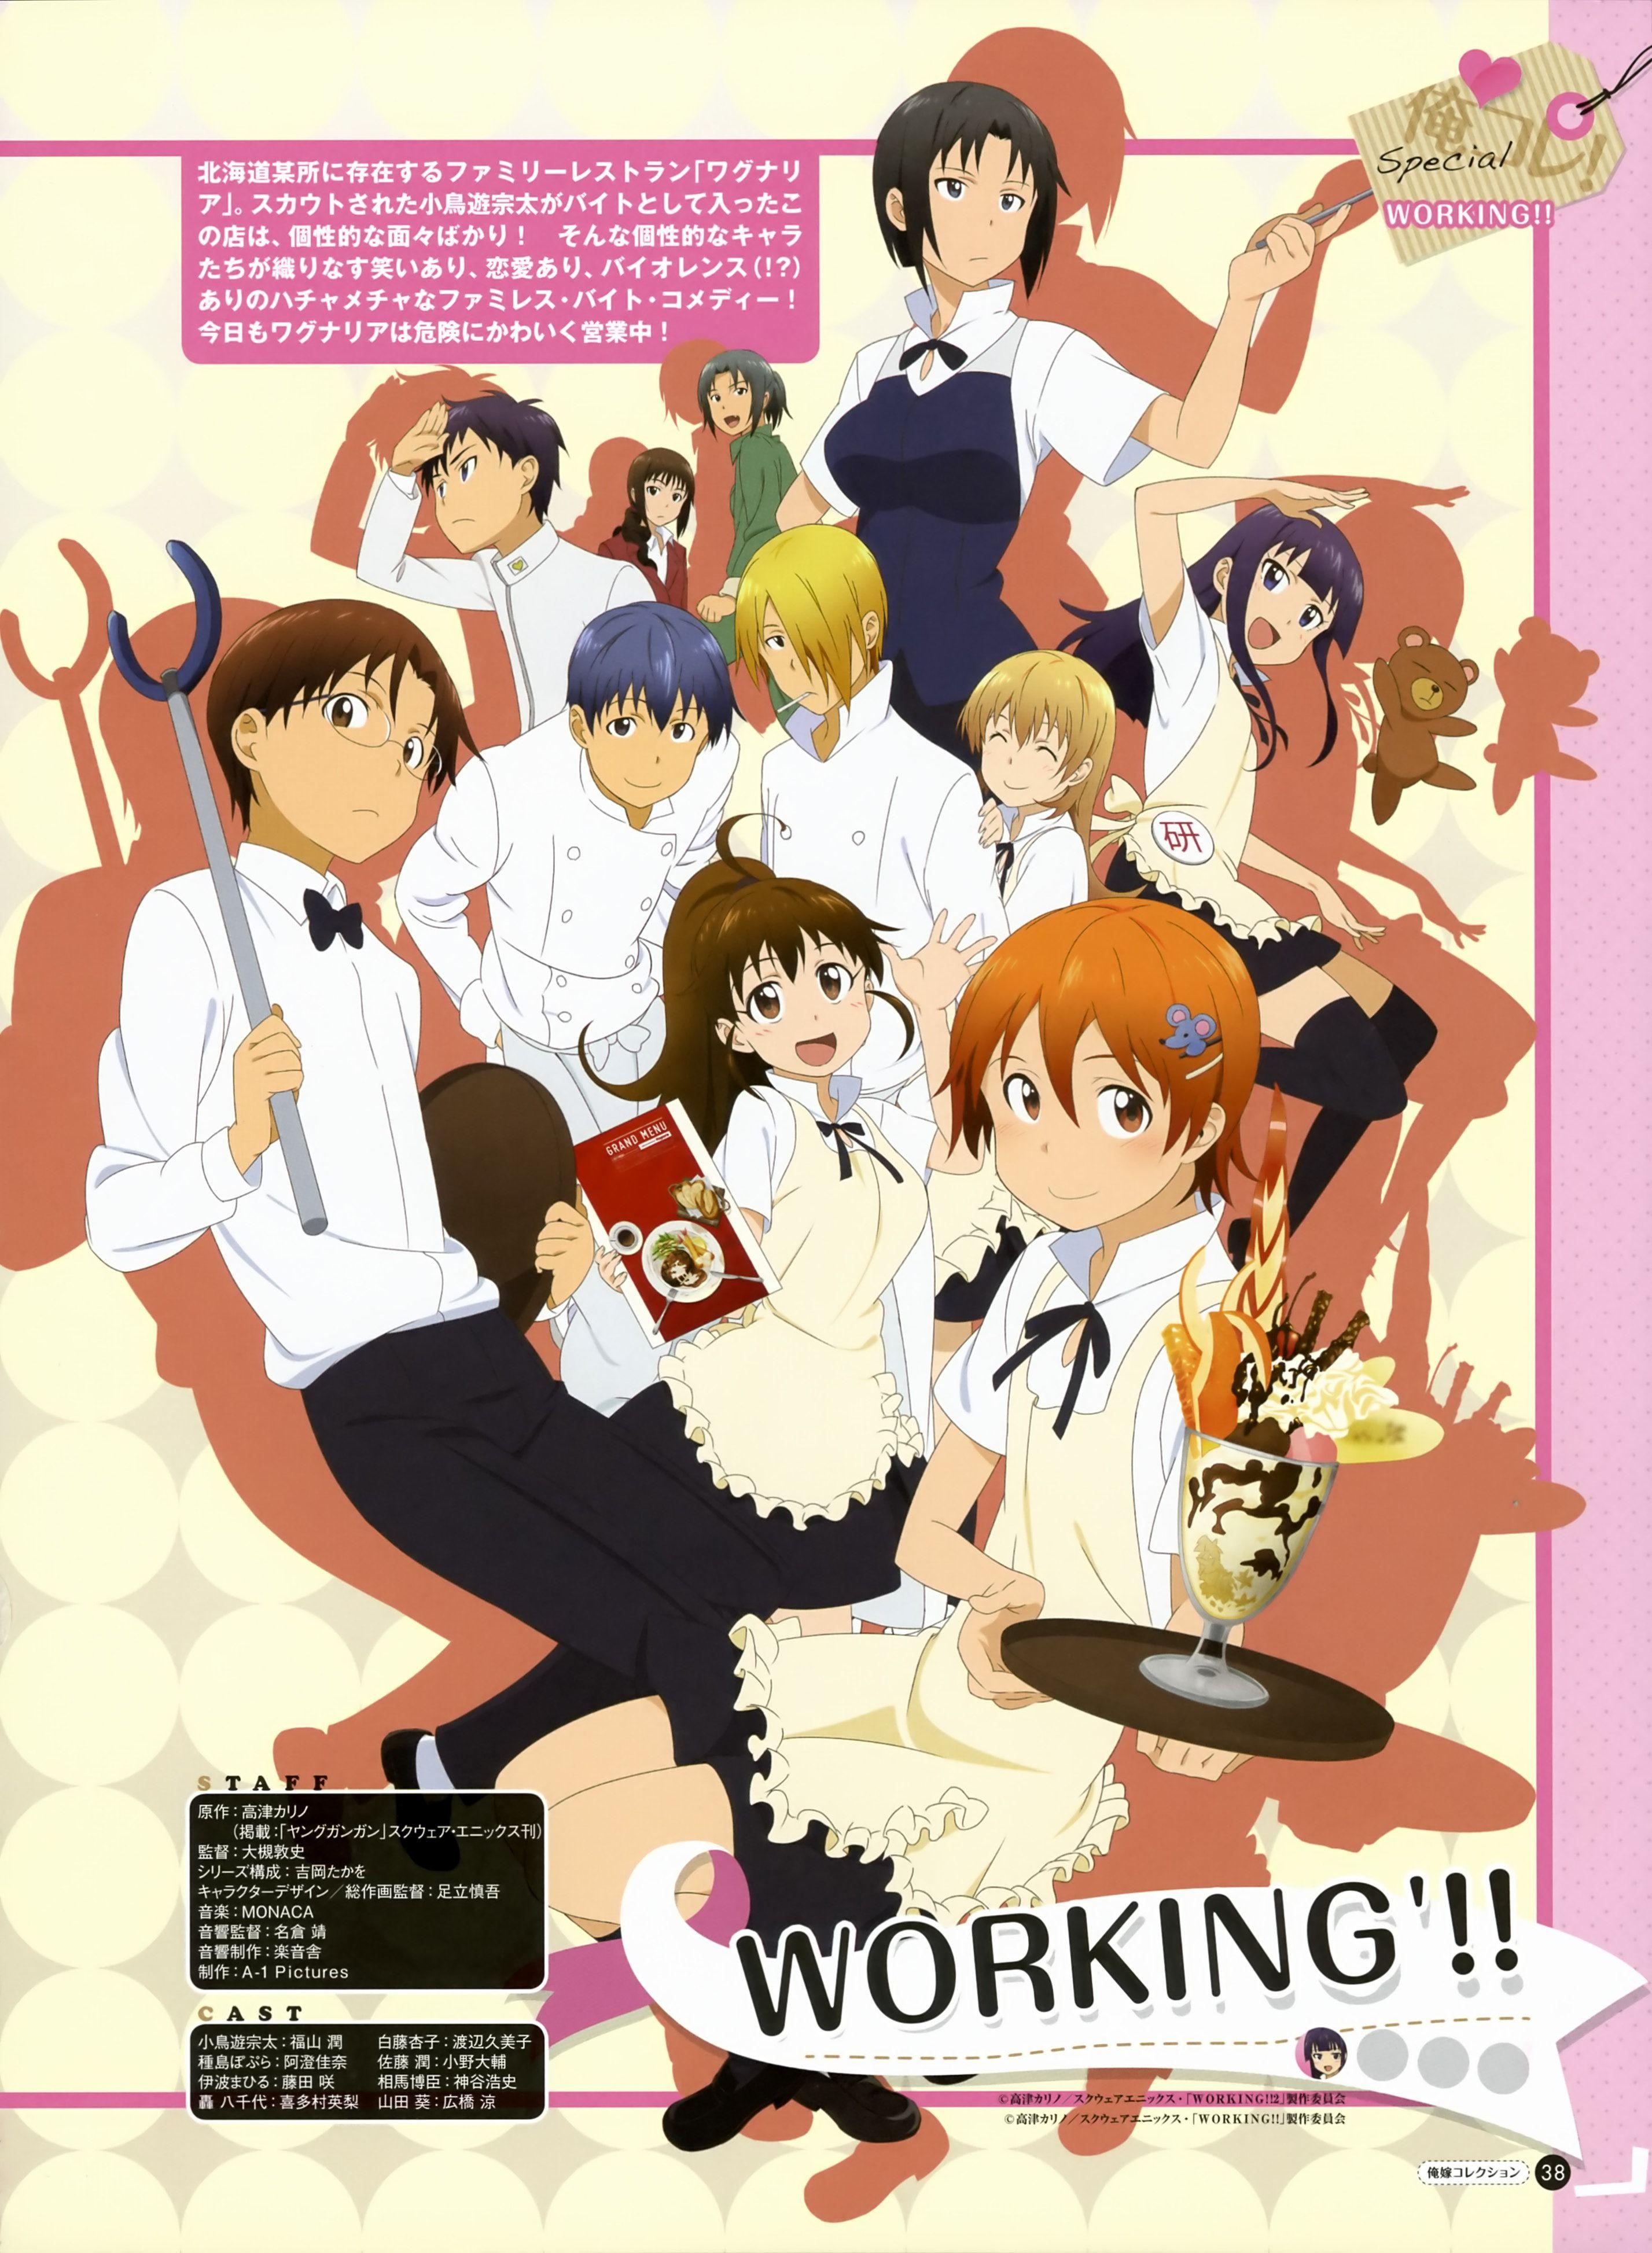 wagnaria anime anime artwork anime characters